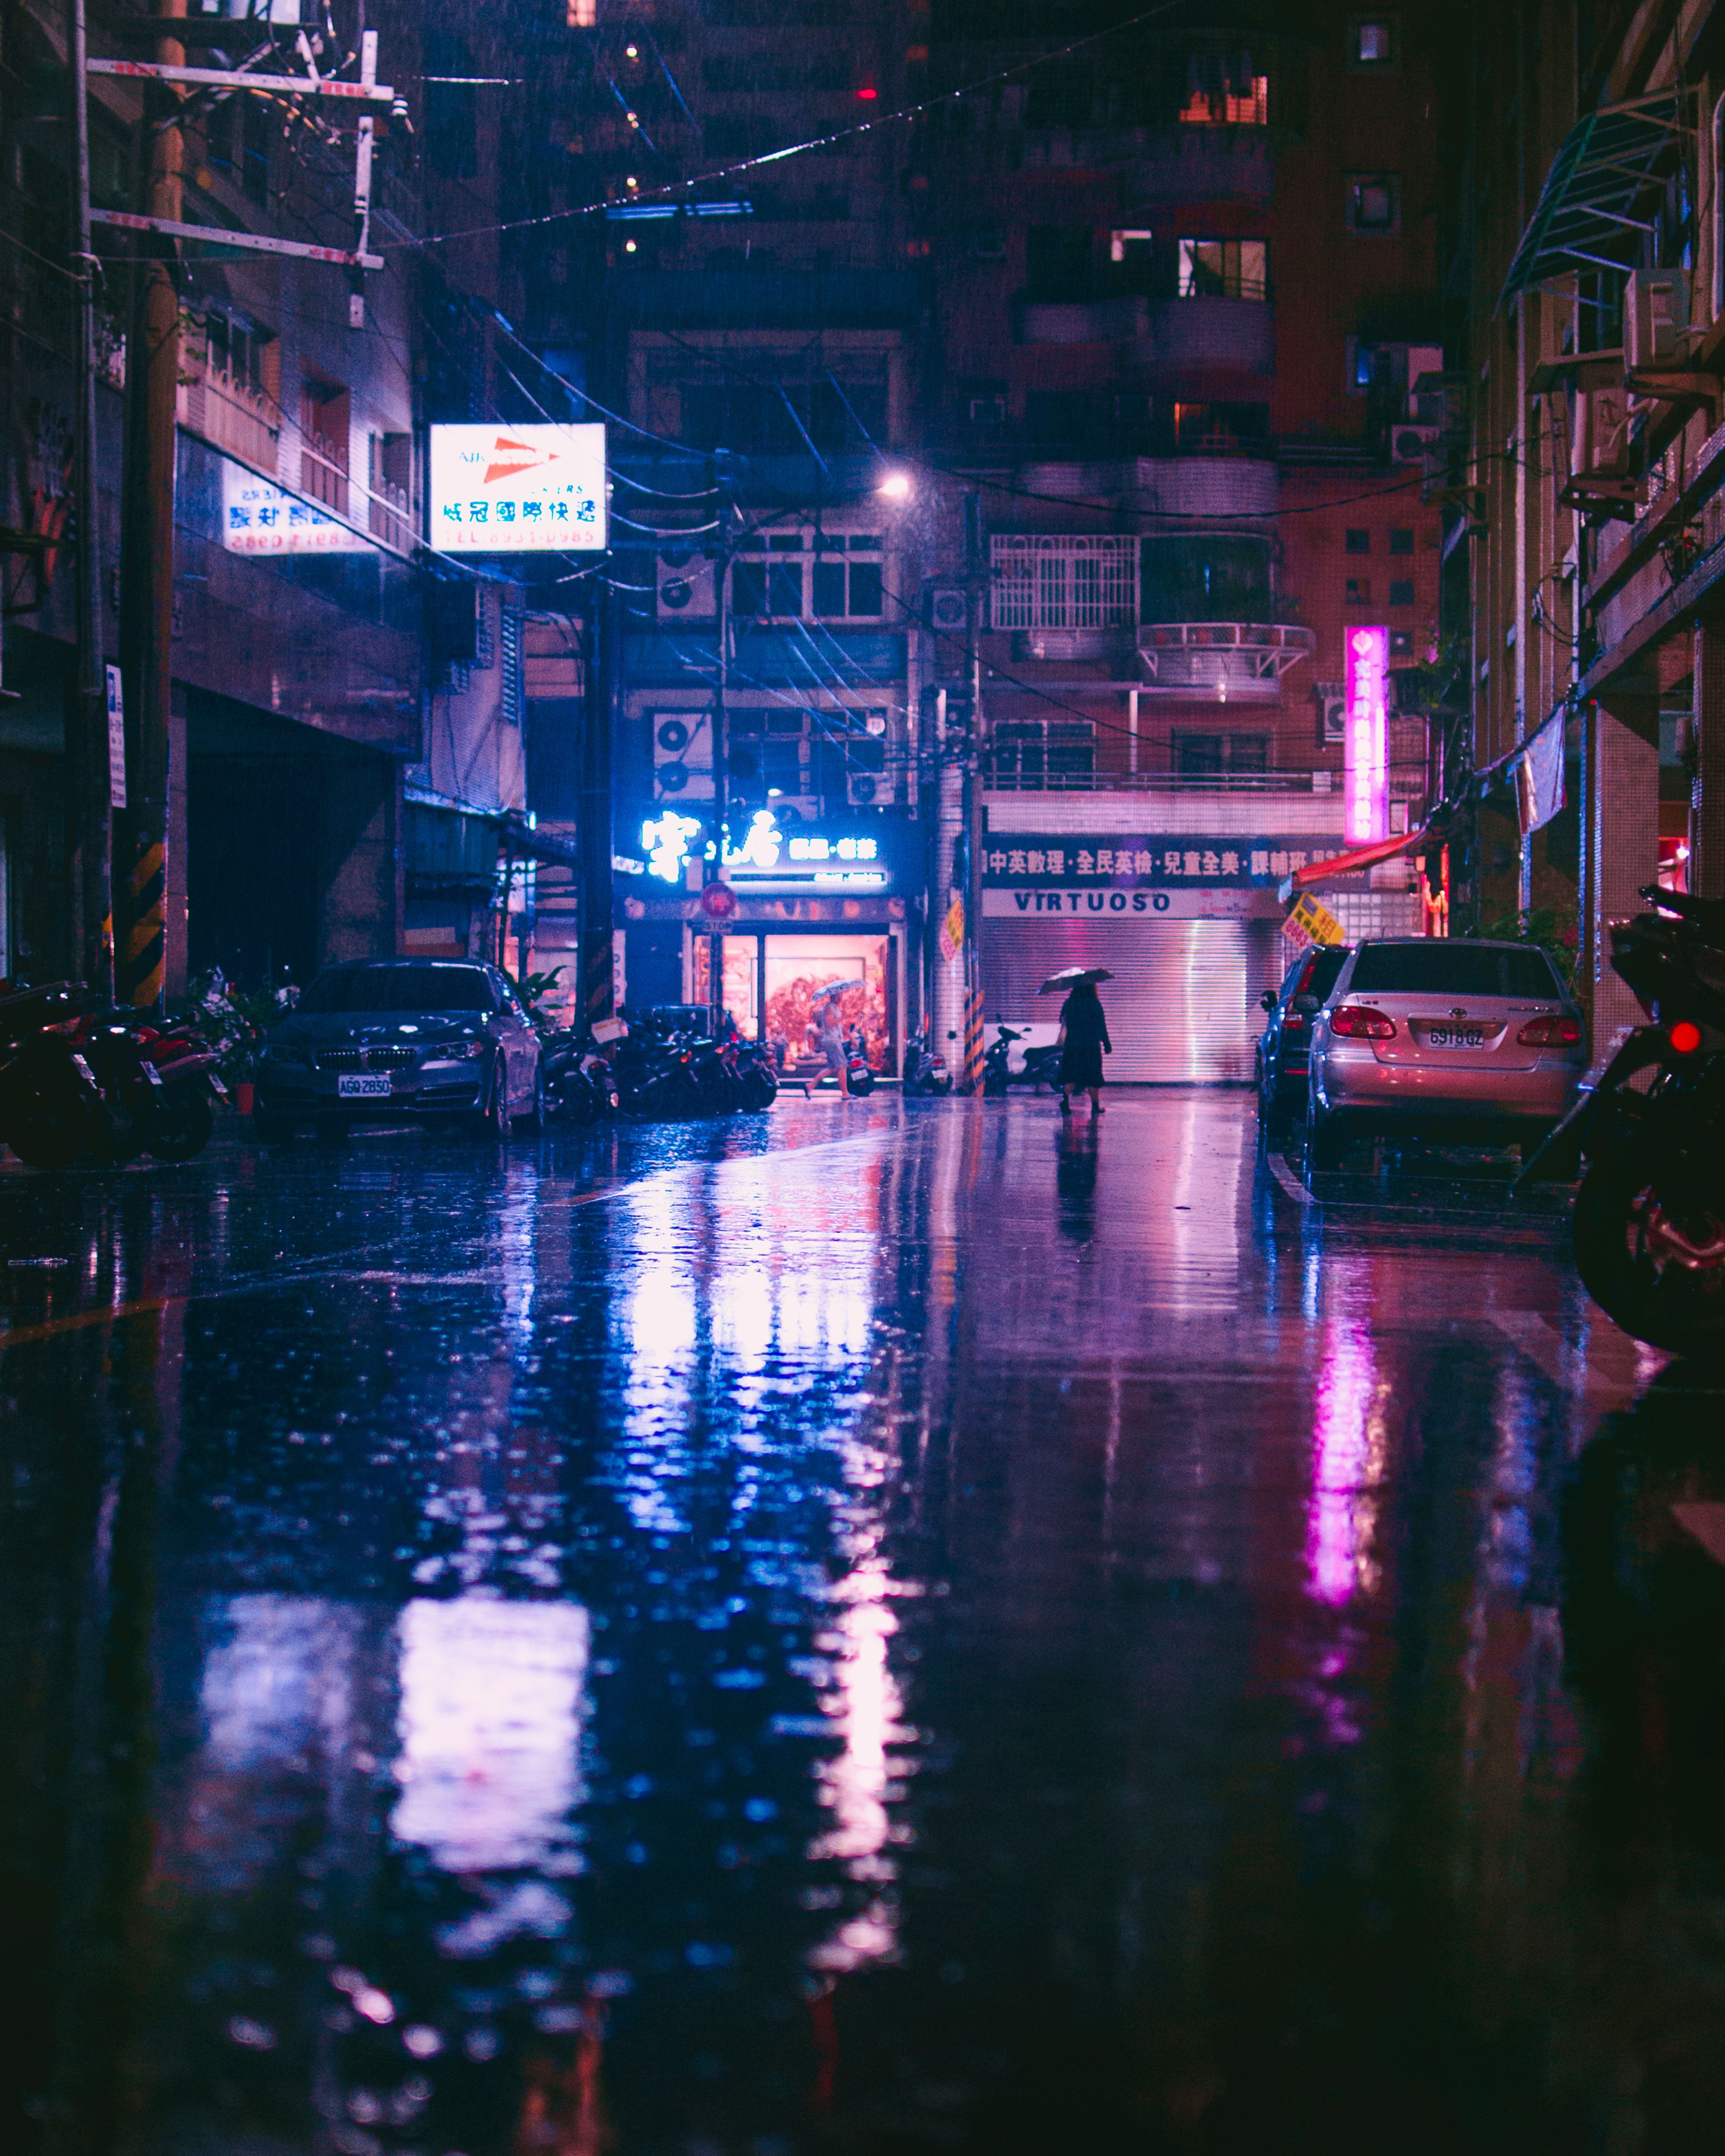 Rainy In Taipei Photo By Andrew Haimerl Andrew Haimerl On Unsplash City Aesthetic Cyberpunk Aesthetic City Rain